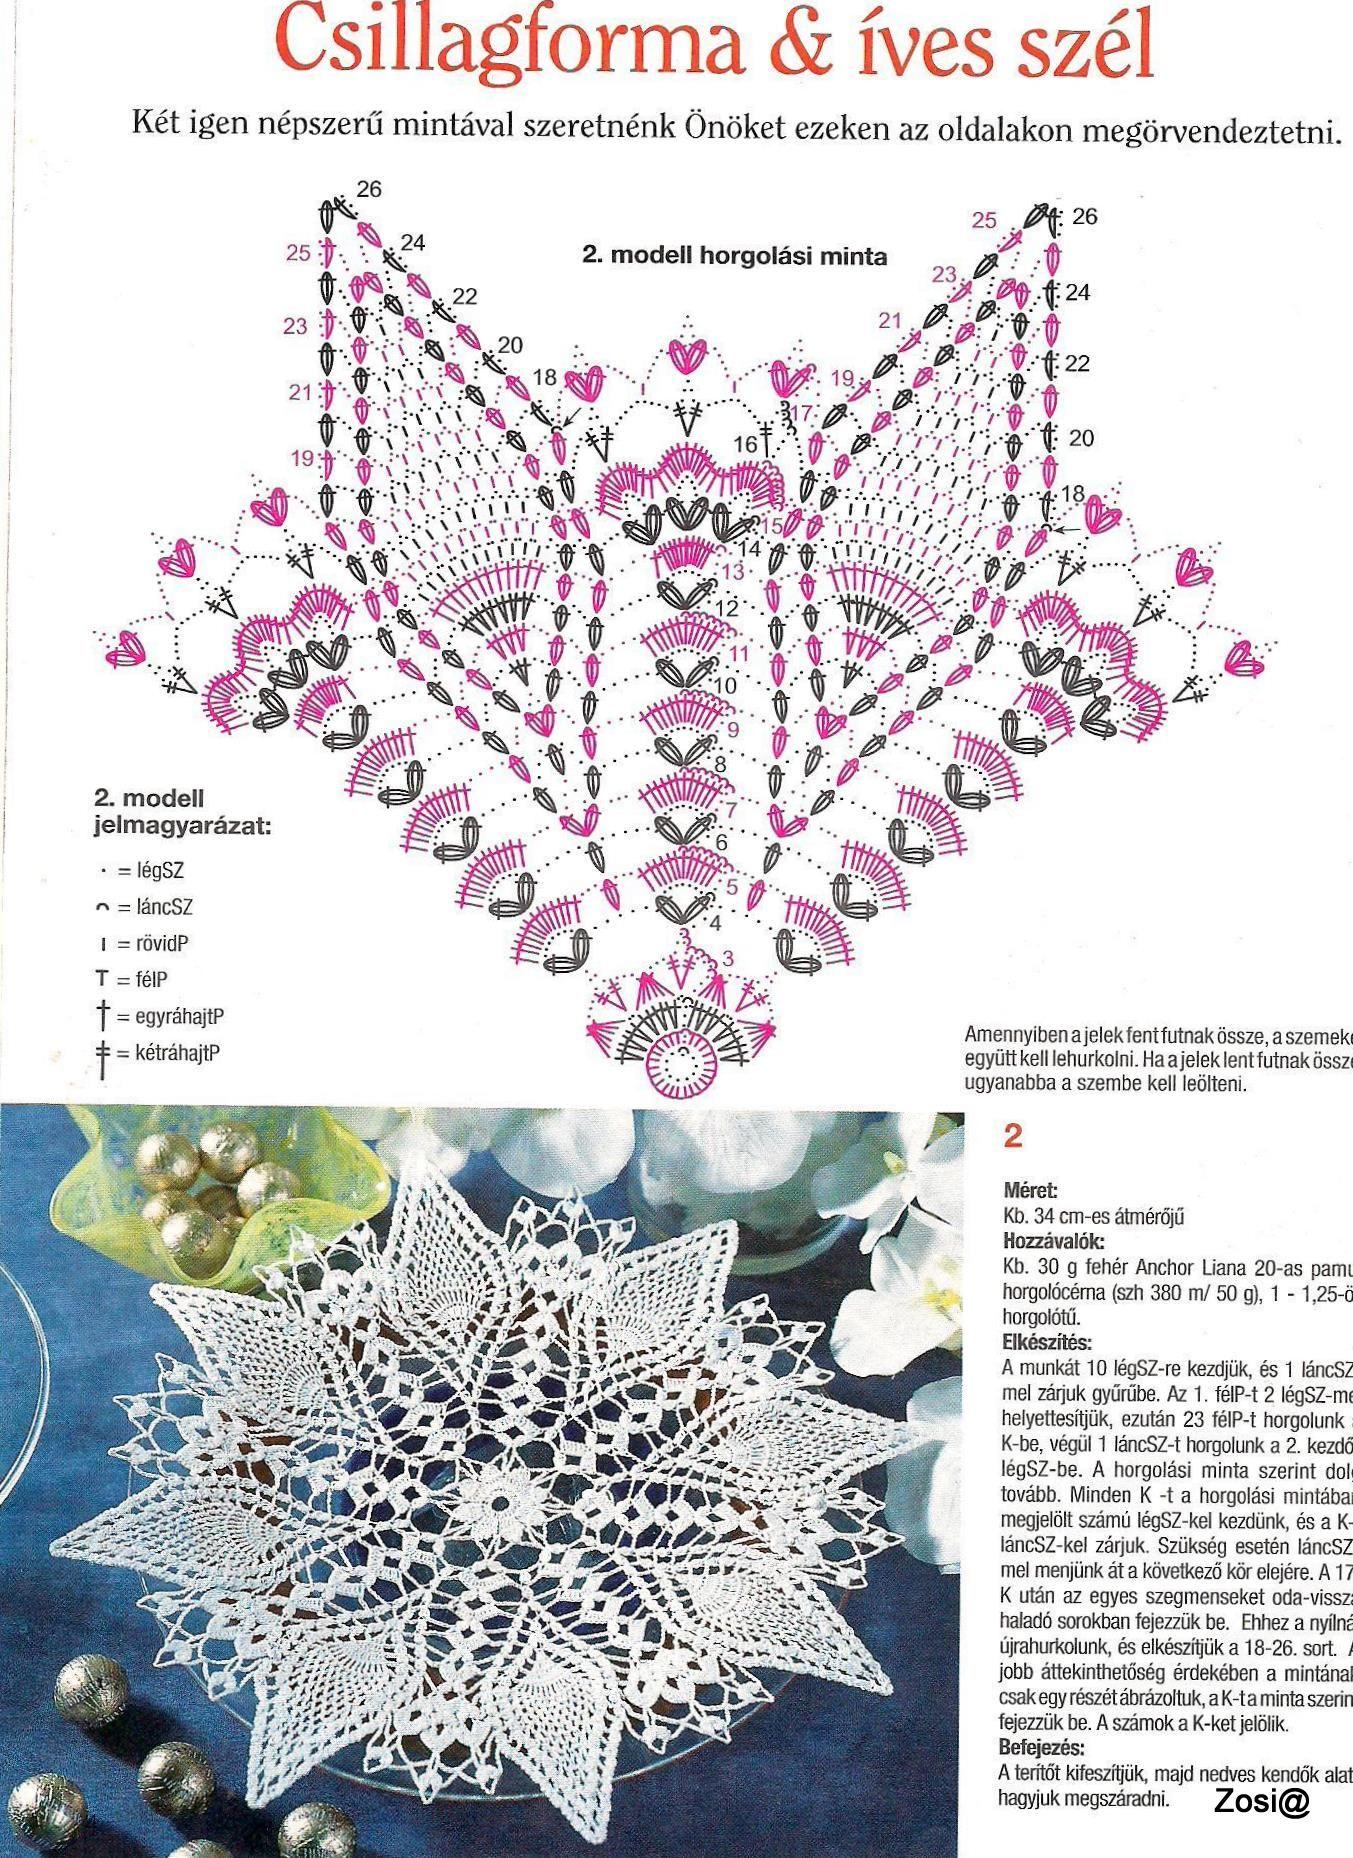 Pin de Lyriam Marmolejo Colina en Tejidos | Pinterest | Carpeta ...